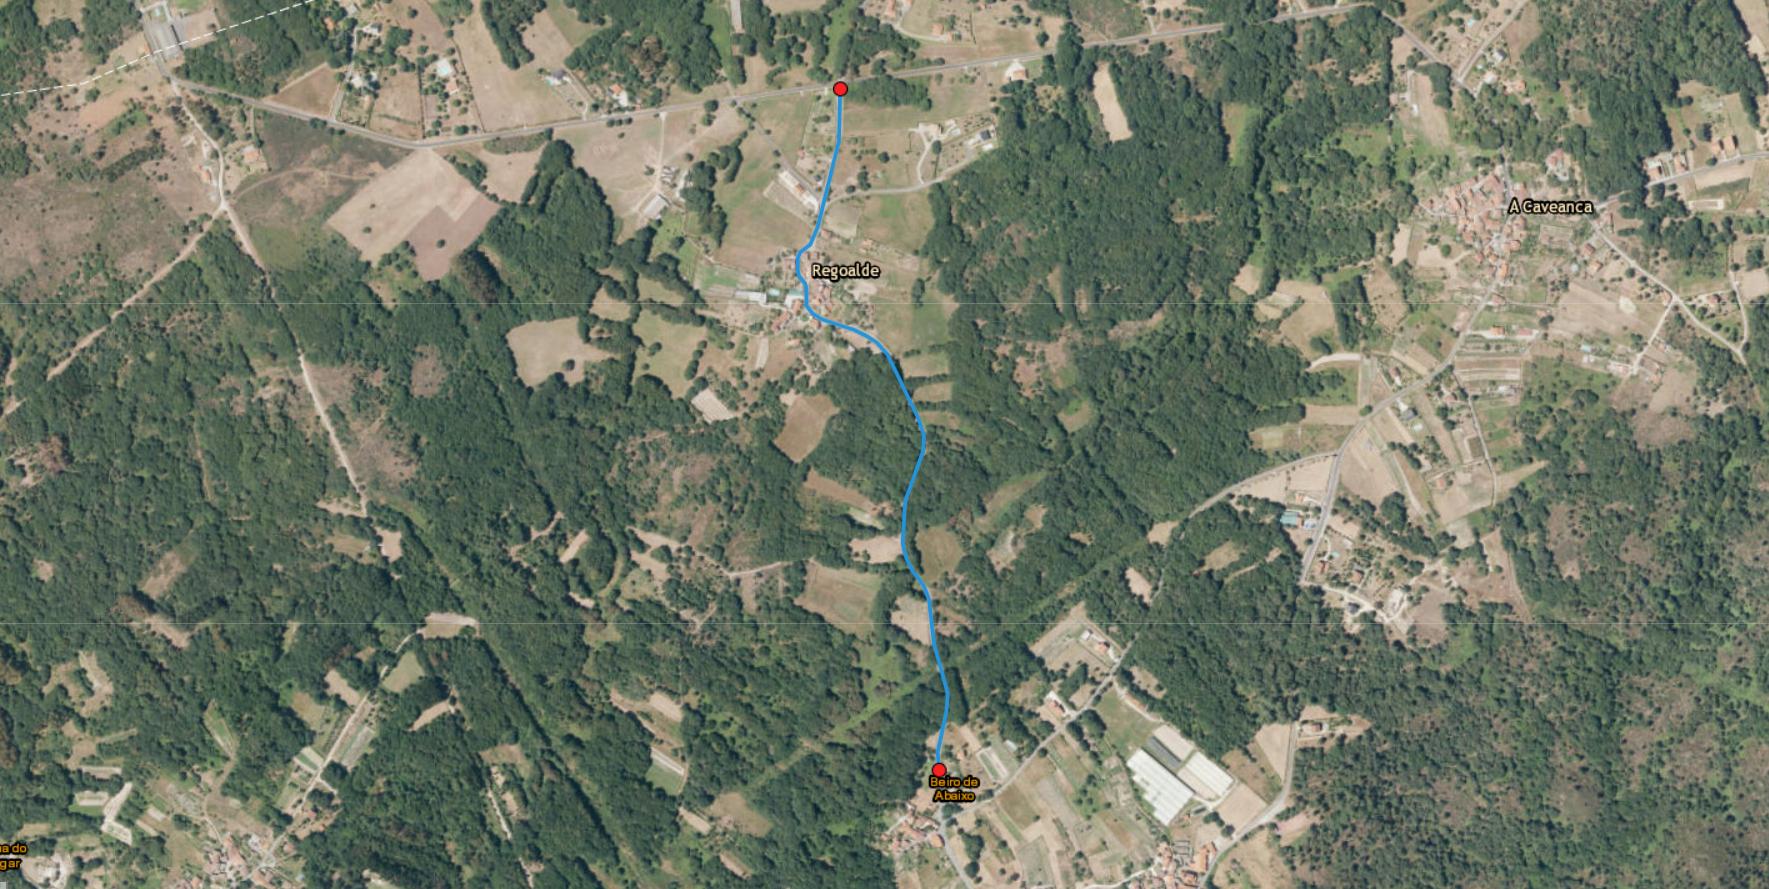 Mapa del tramo de Regoalde